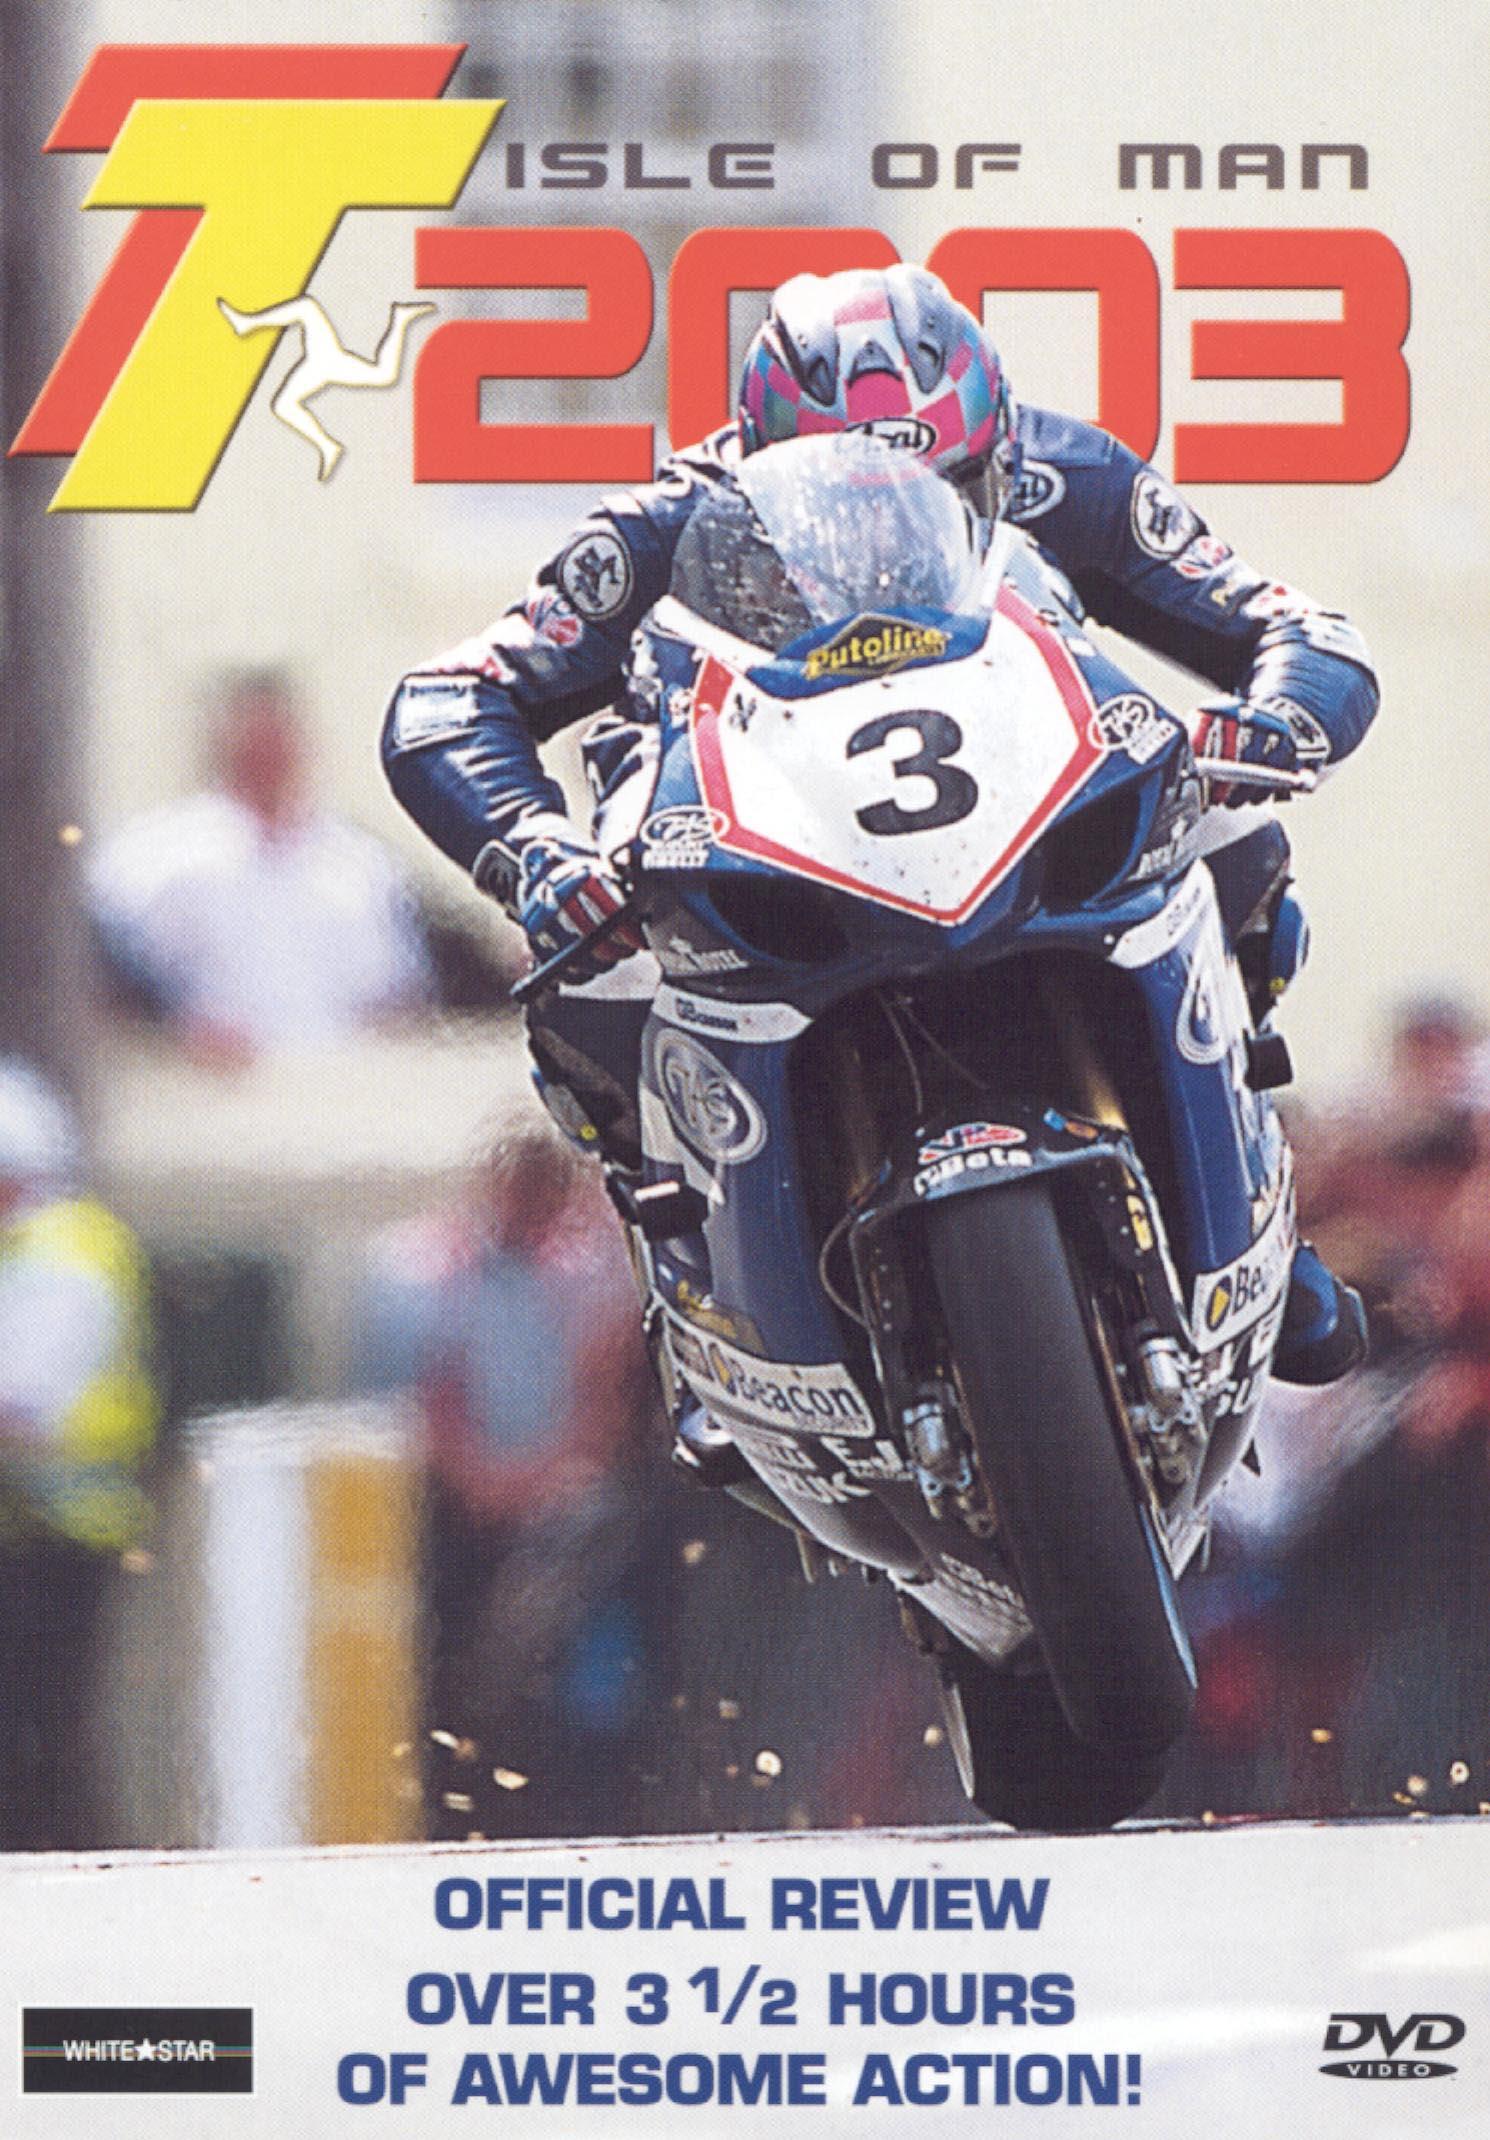 Isle of Man TT 2003 Review